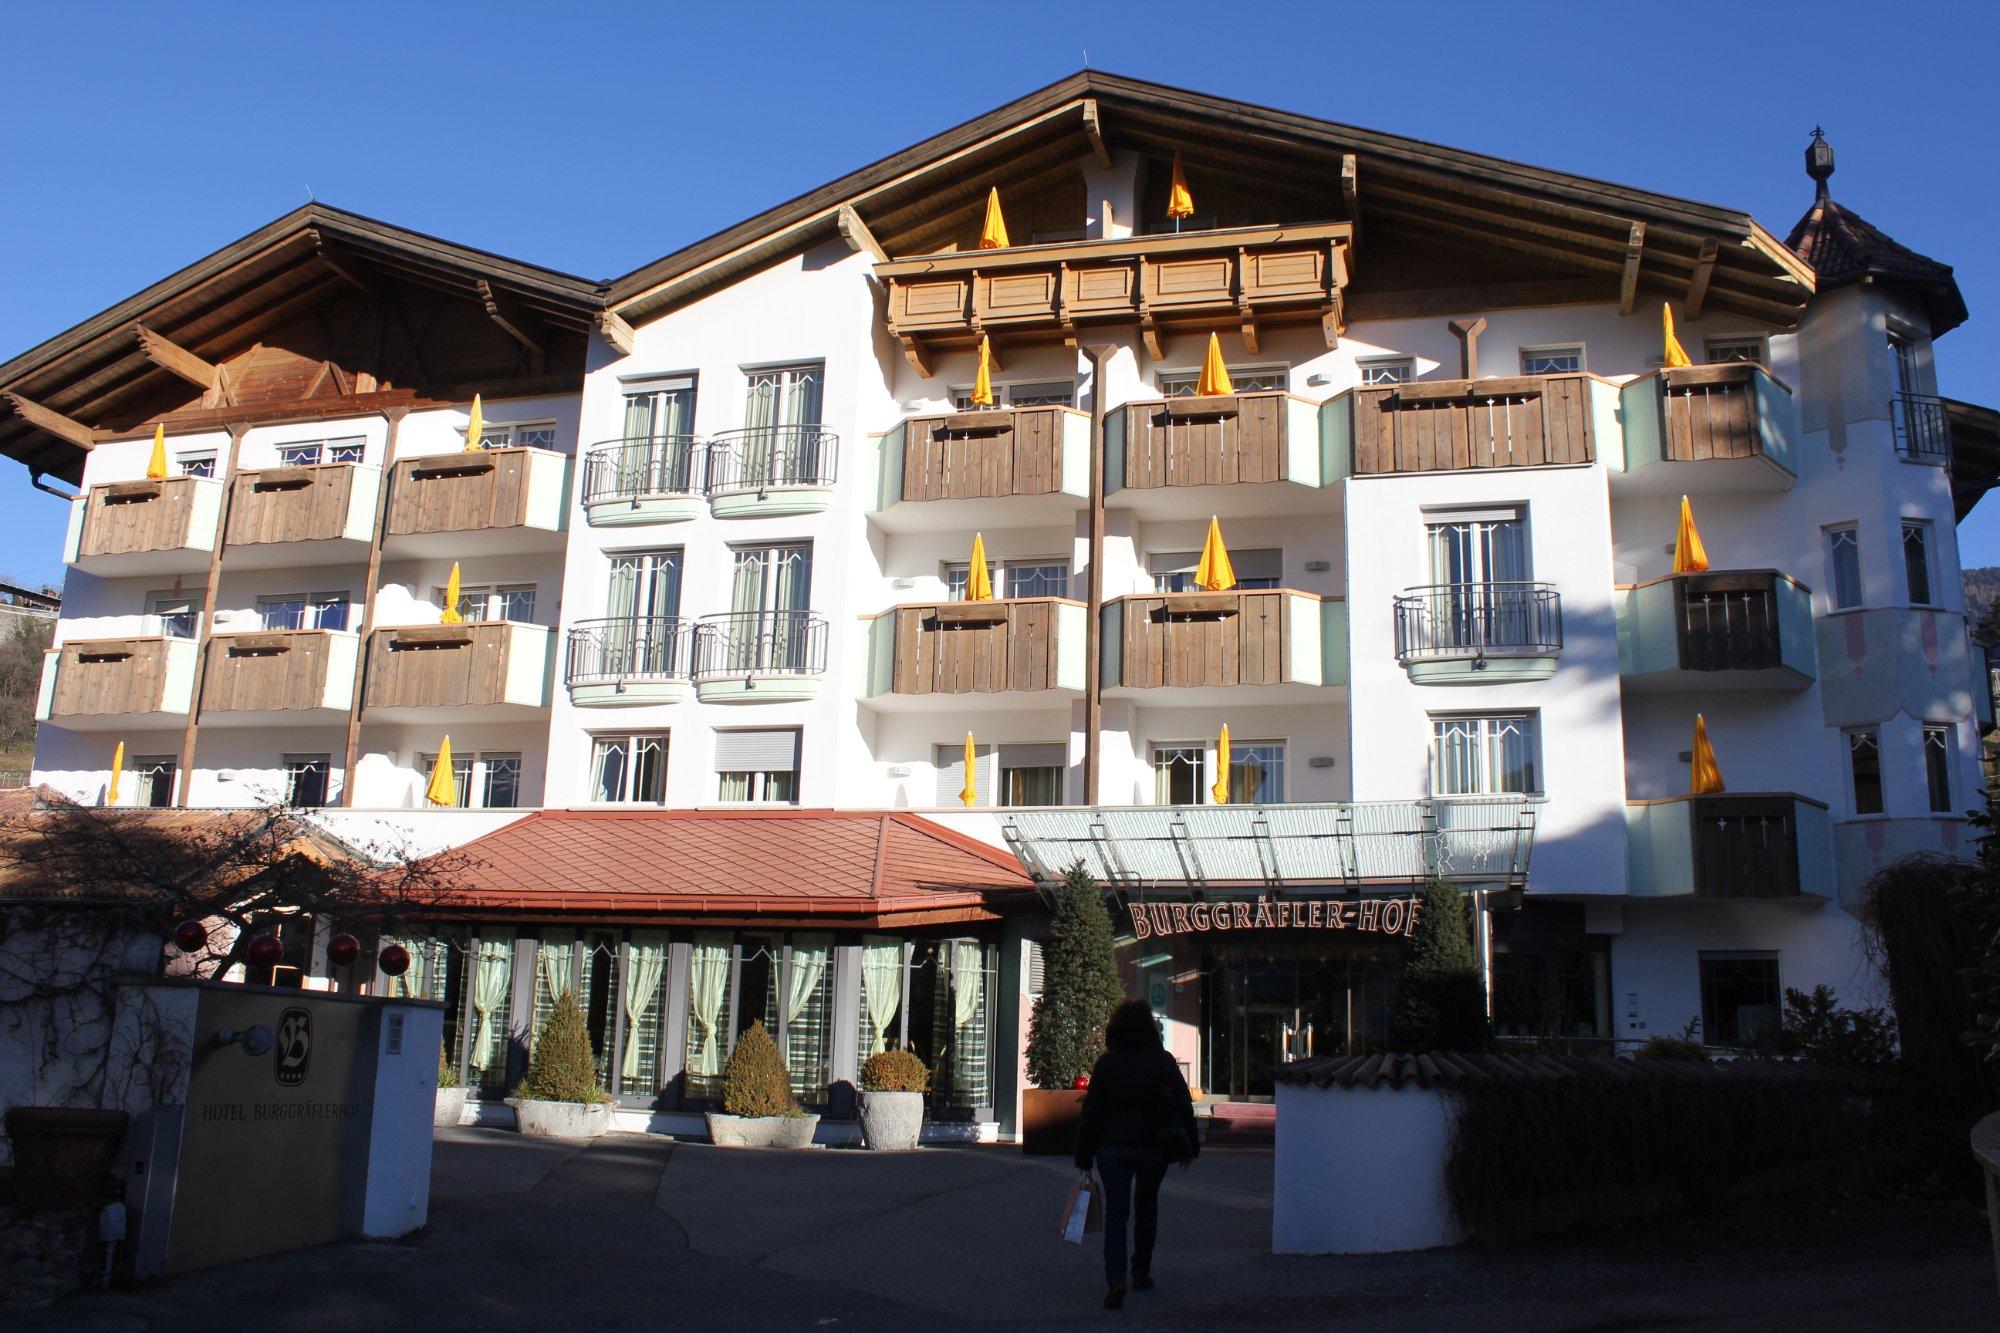 Hotel Burggraeflerhof